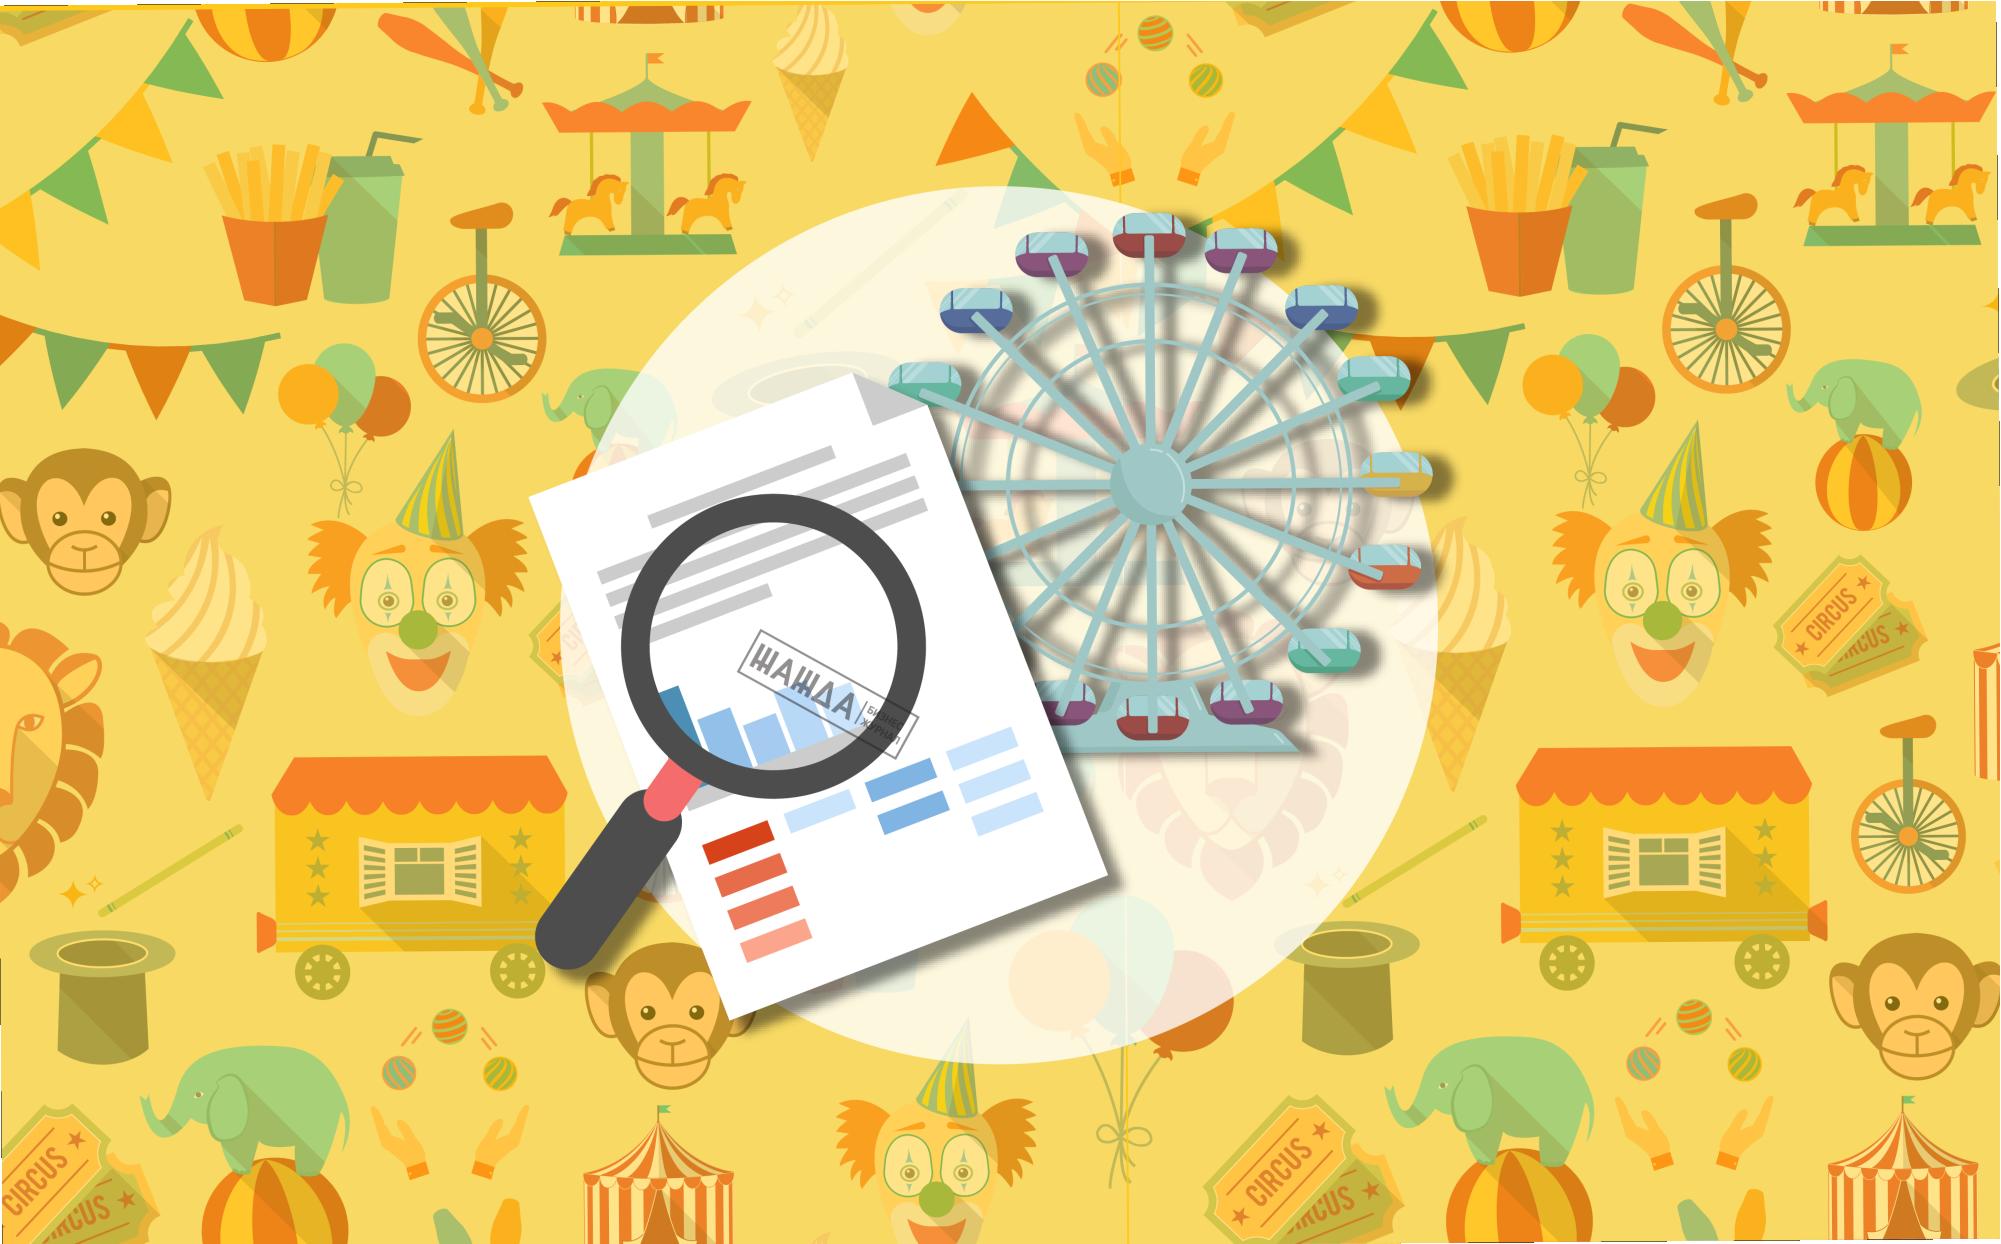 Образец бизнес плана парка идеи ниш для бизнеса